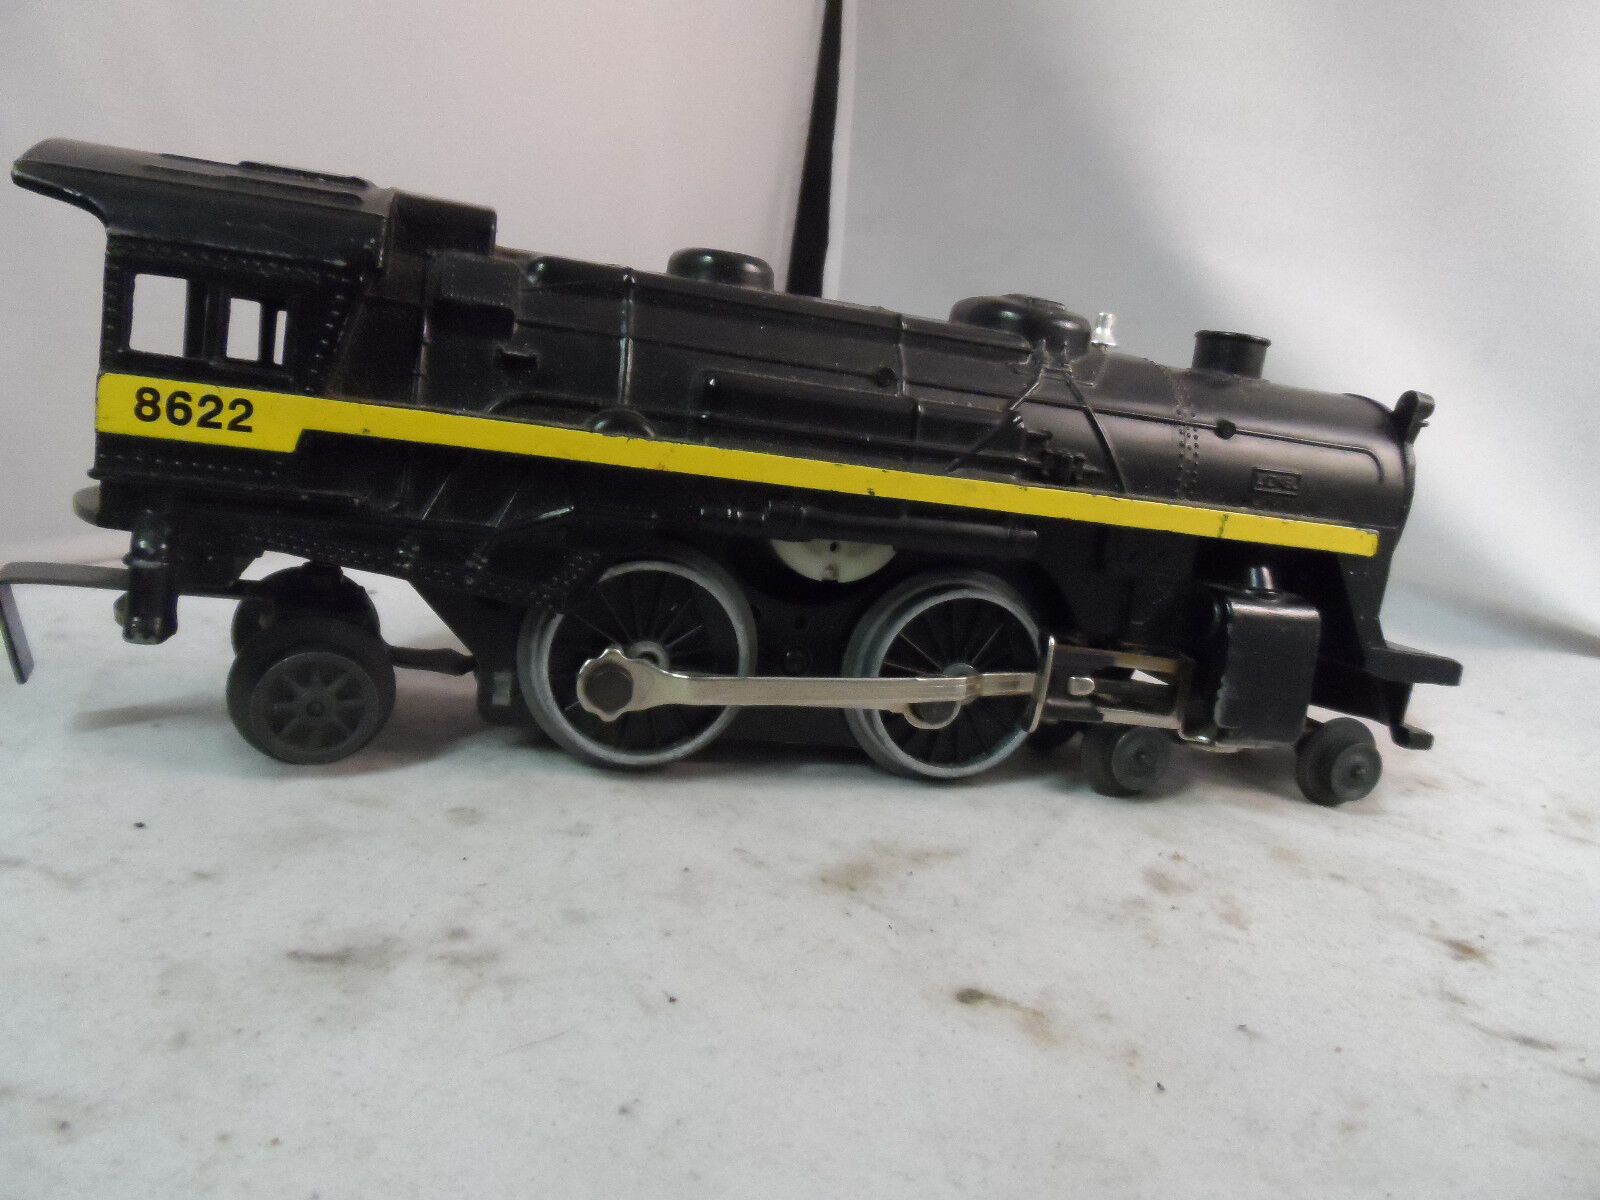 Lionel O Scale Locomotive  8622 Untested